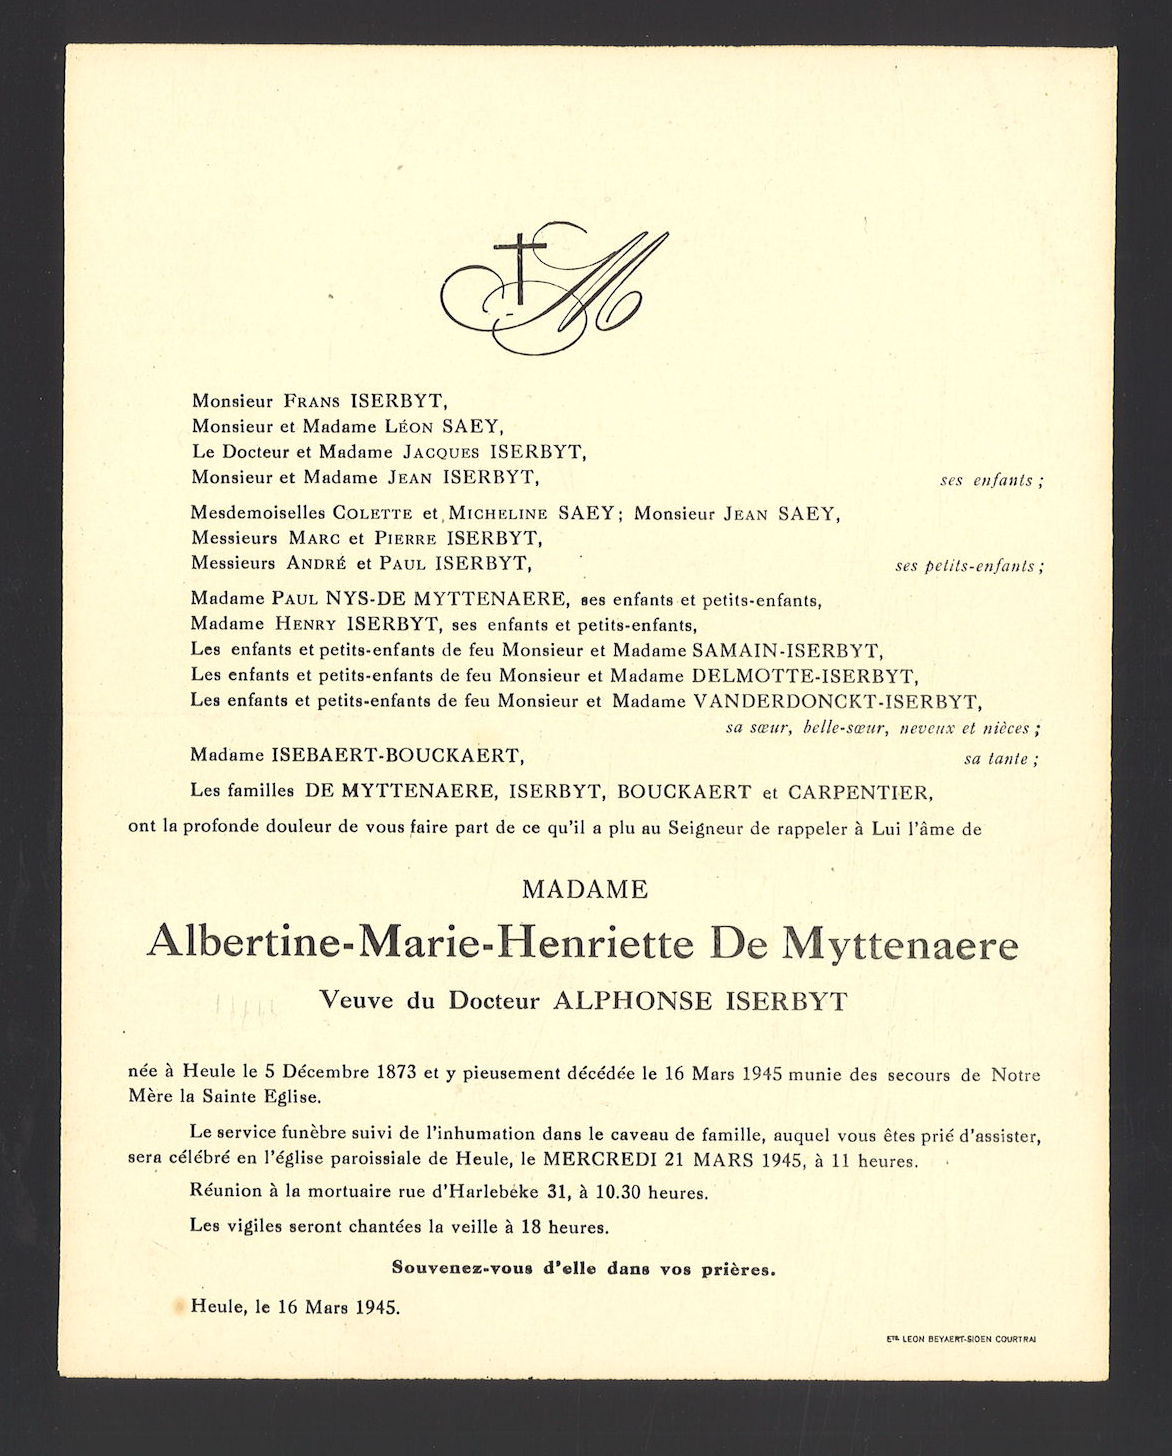 Albertine-Marie-Henriette De Myttenaere